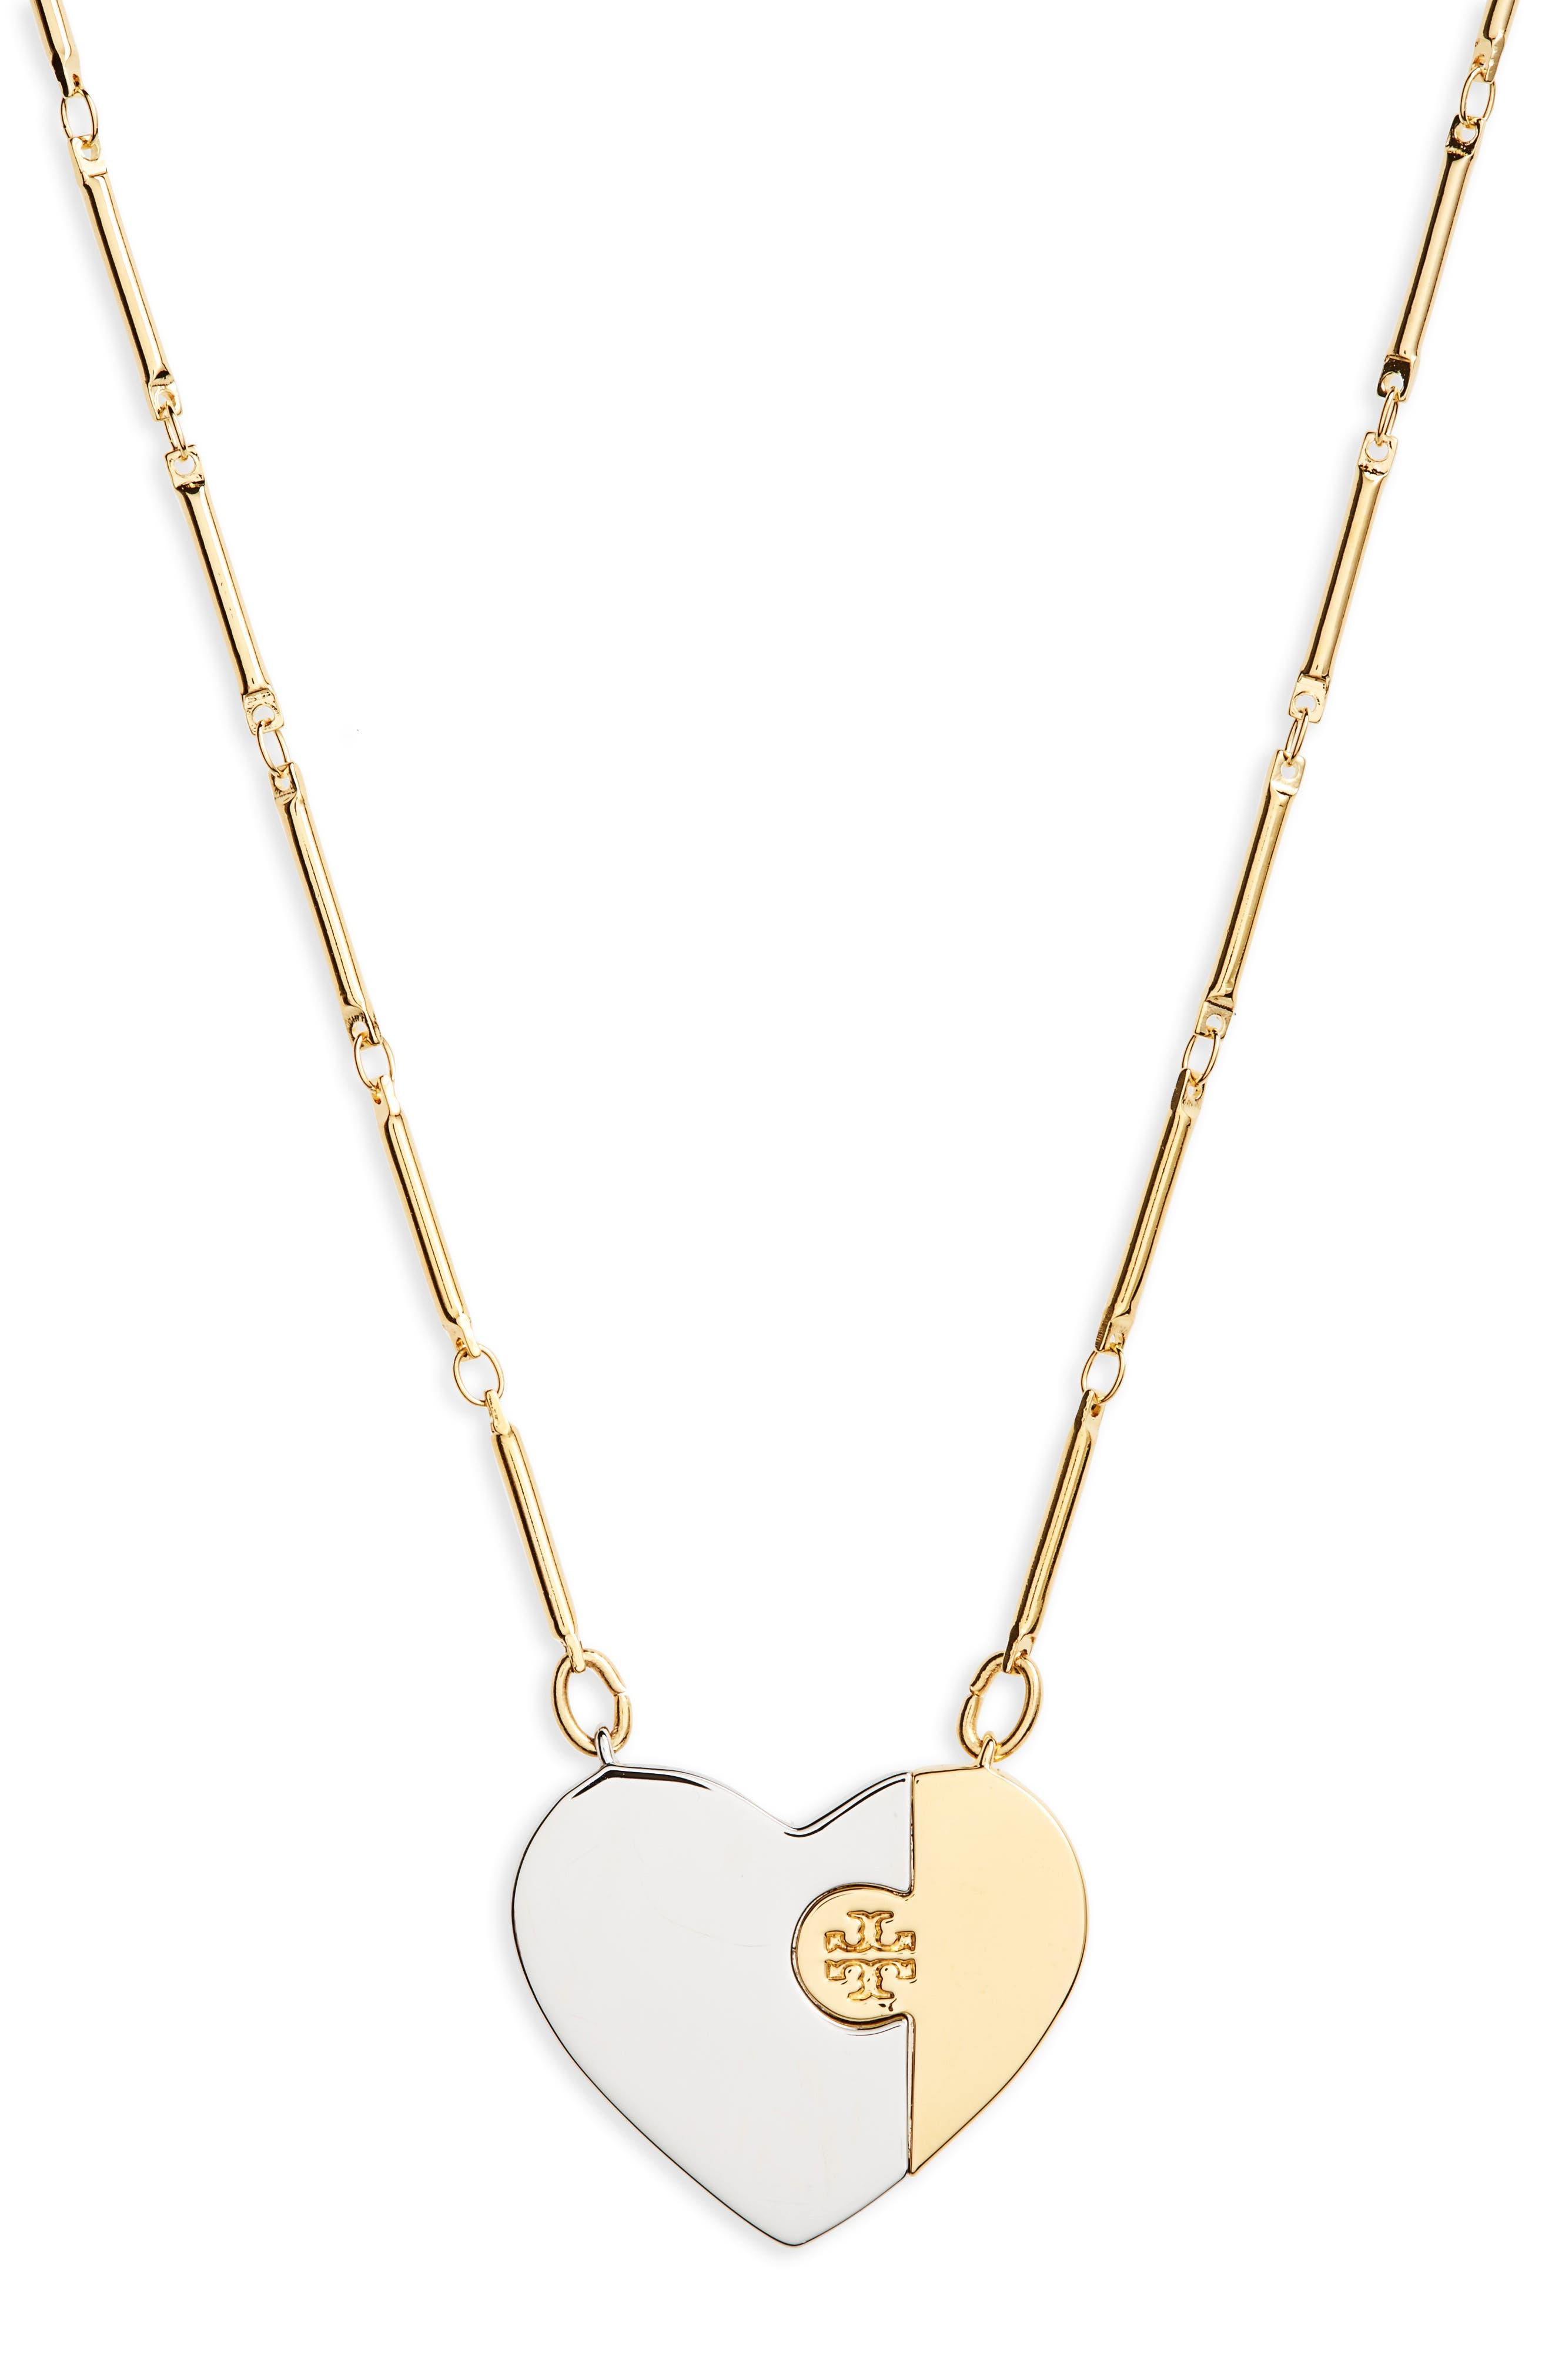 Tory Burch Puzzle Heart Pendant Necklace